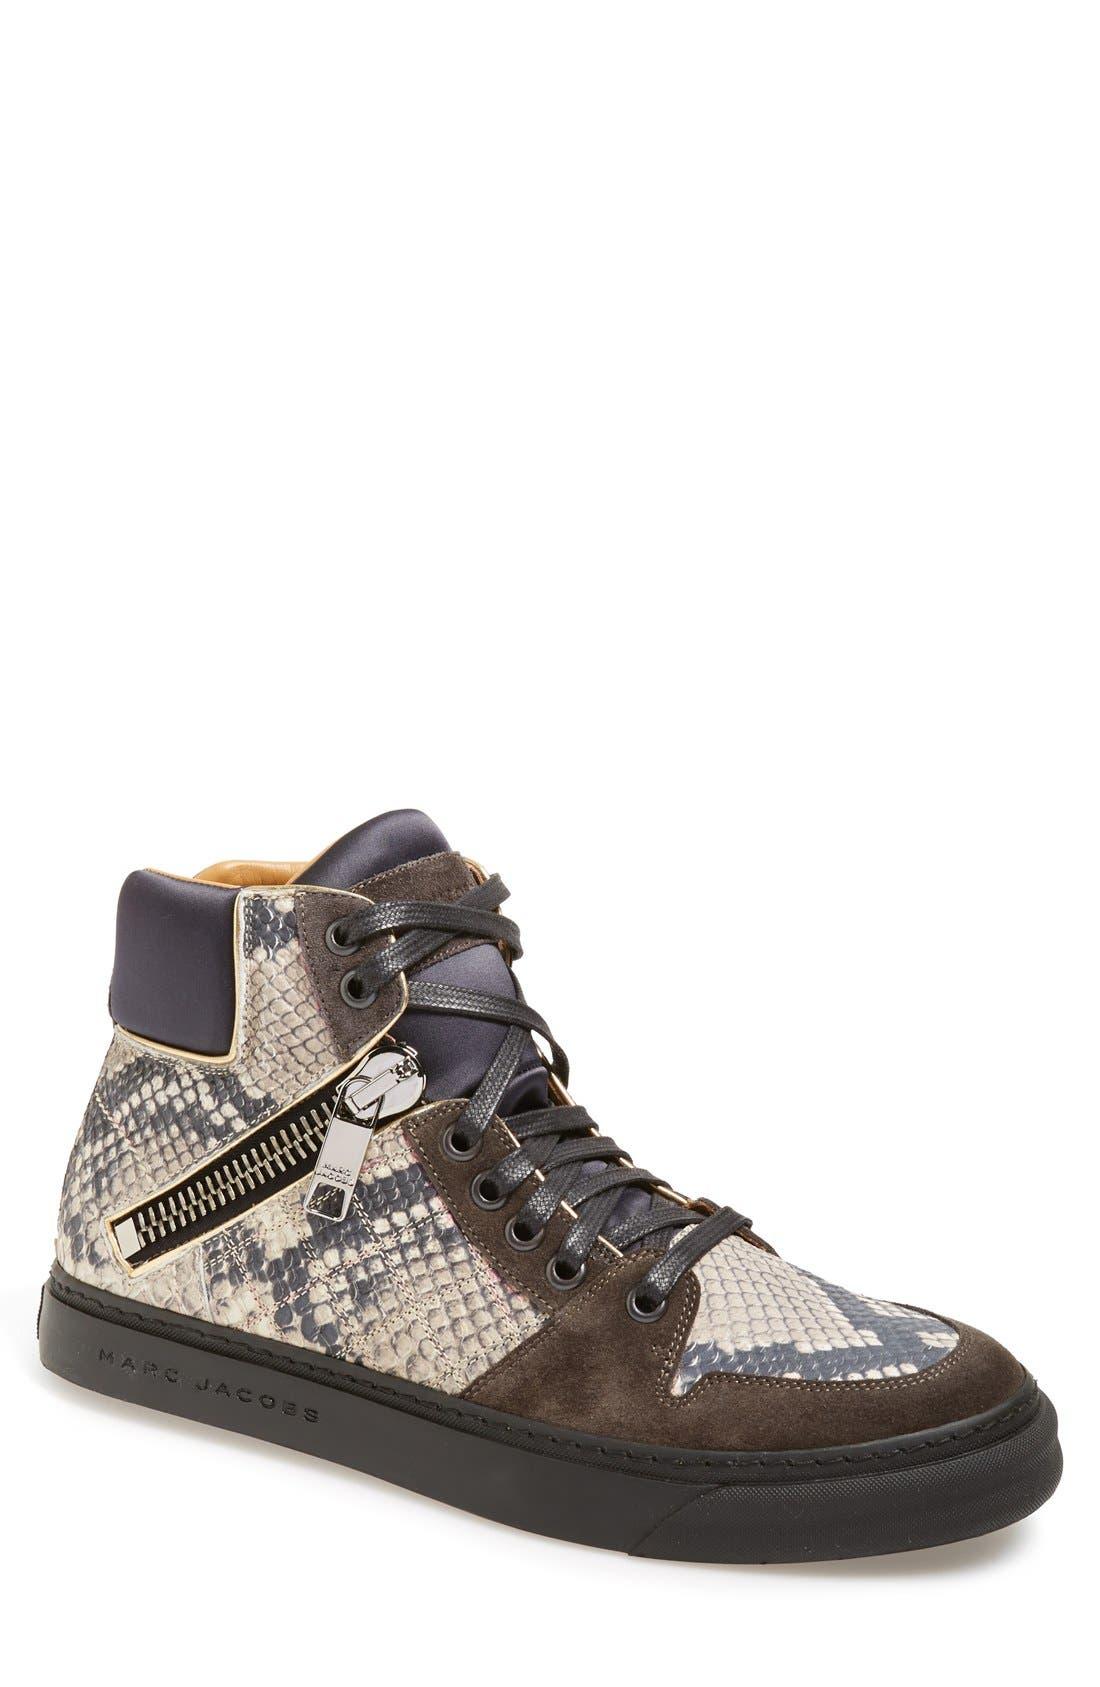 'Atomic Zip' Snake Print High Top Sneaker,                             Main thumbnail 1, color,                             001